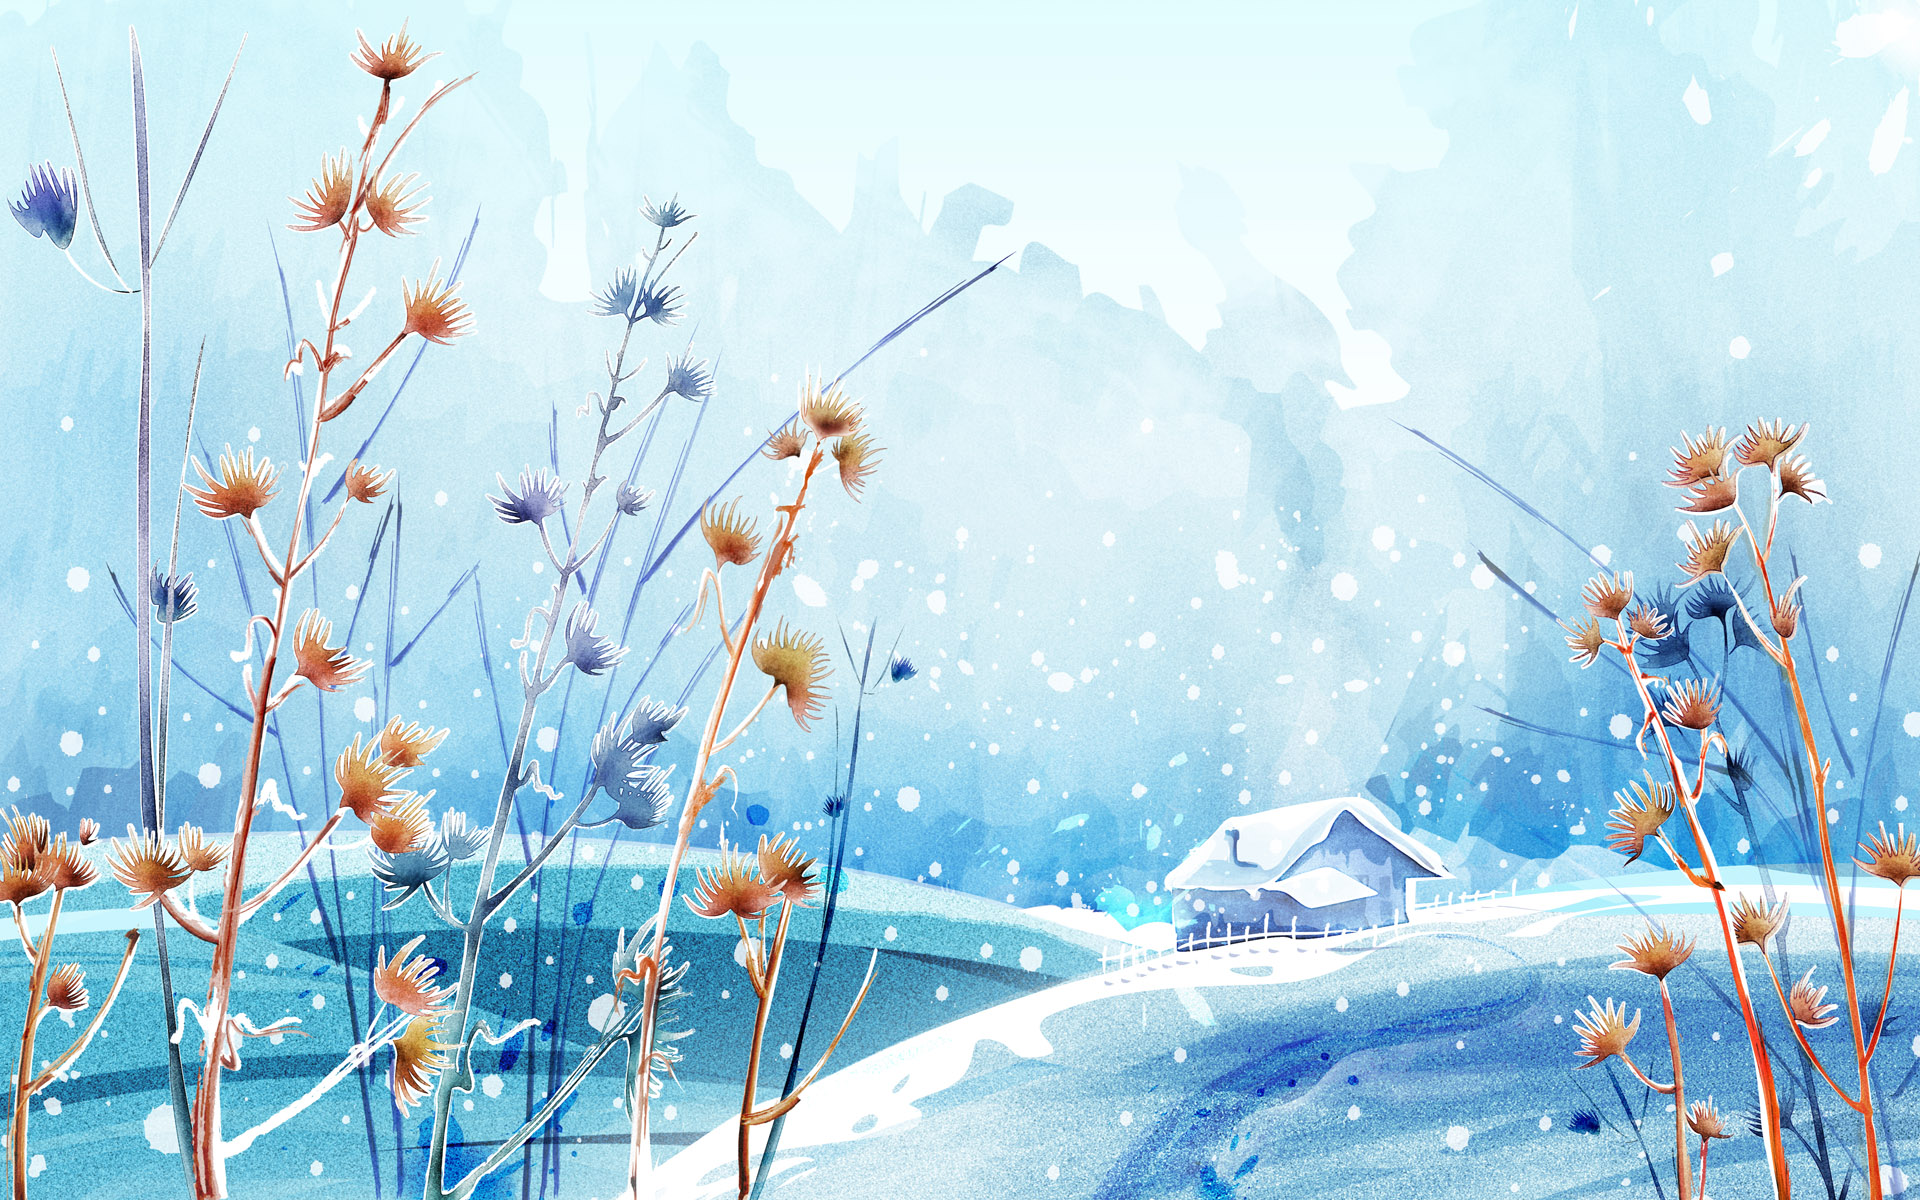 Winter Wallpaper HD Download 1920x1200